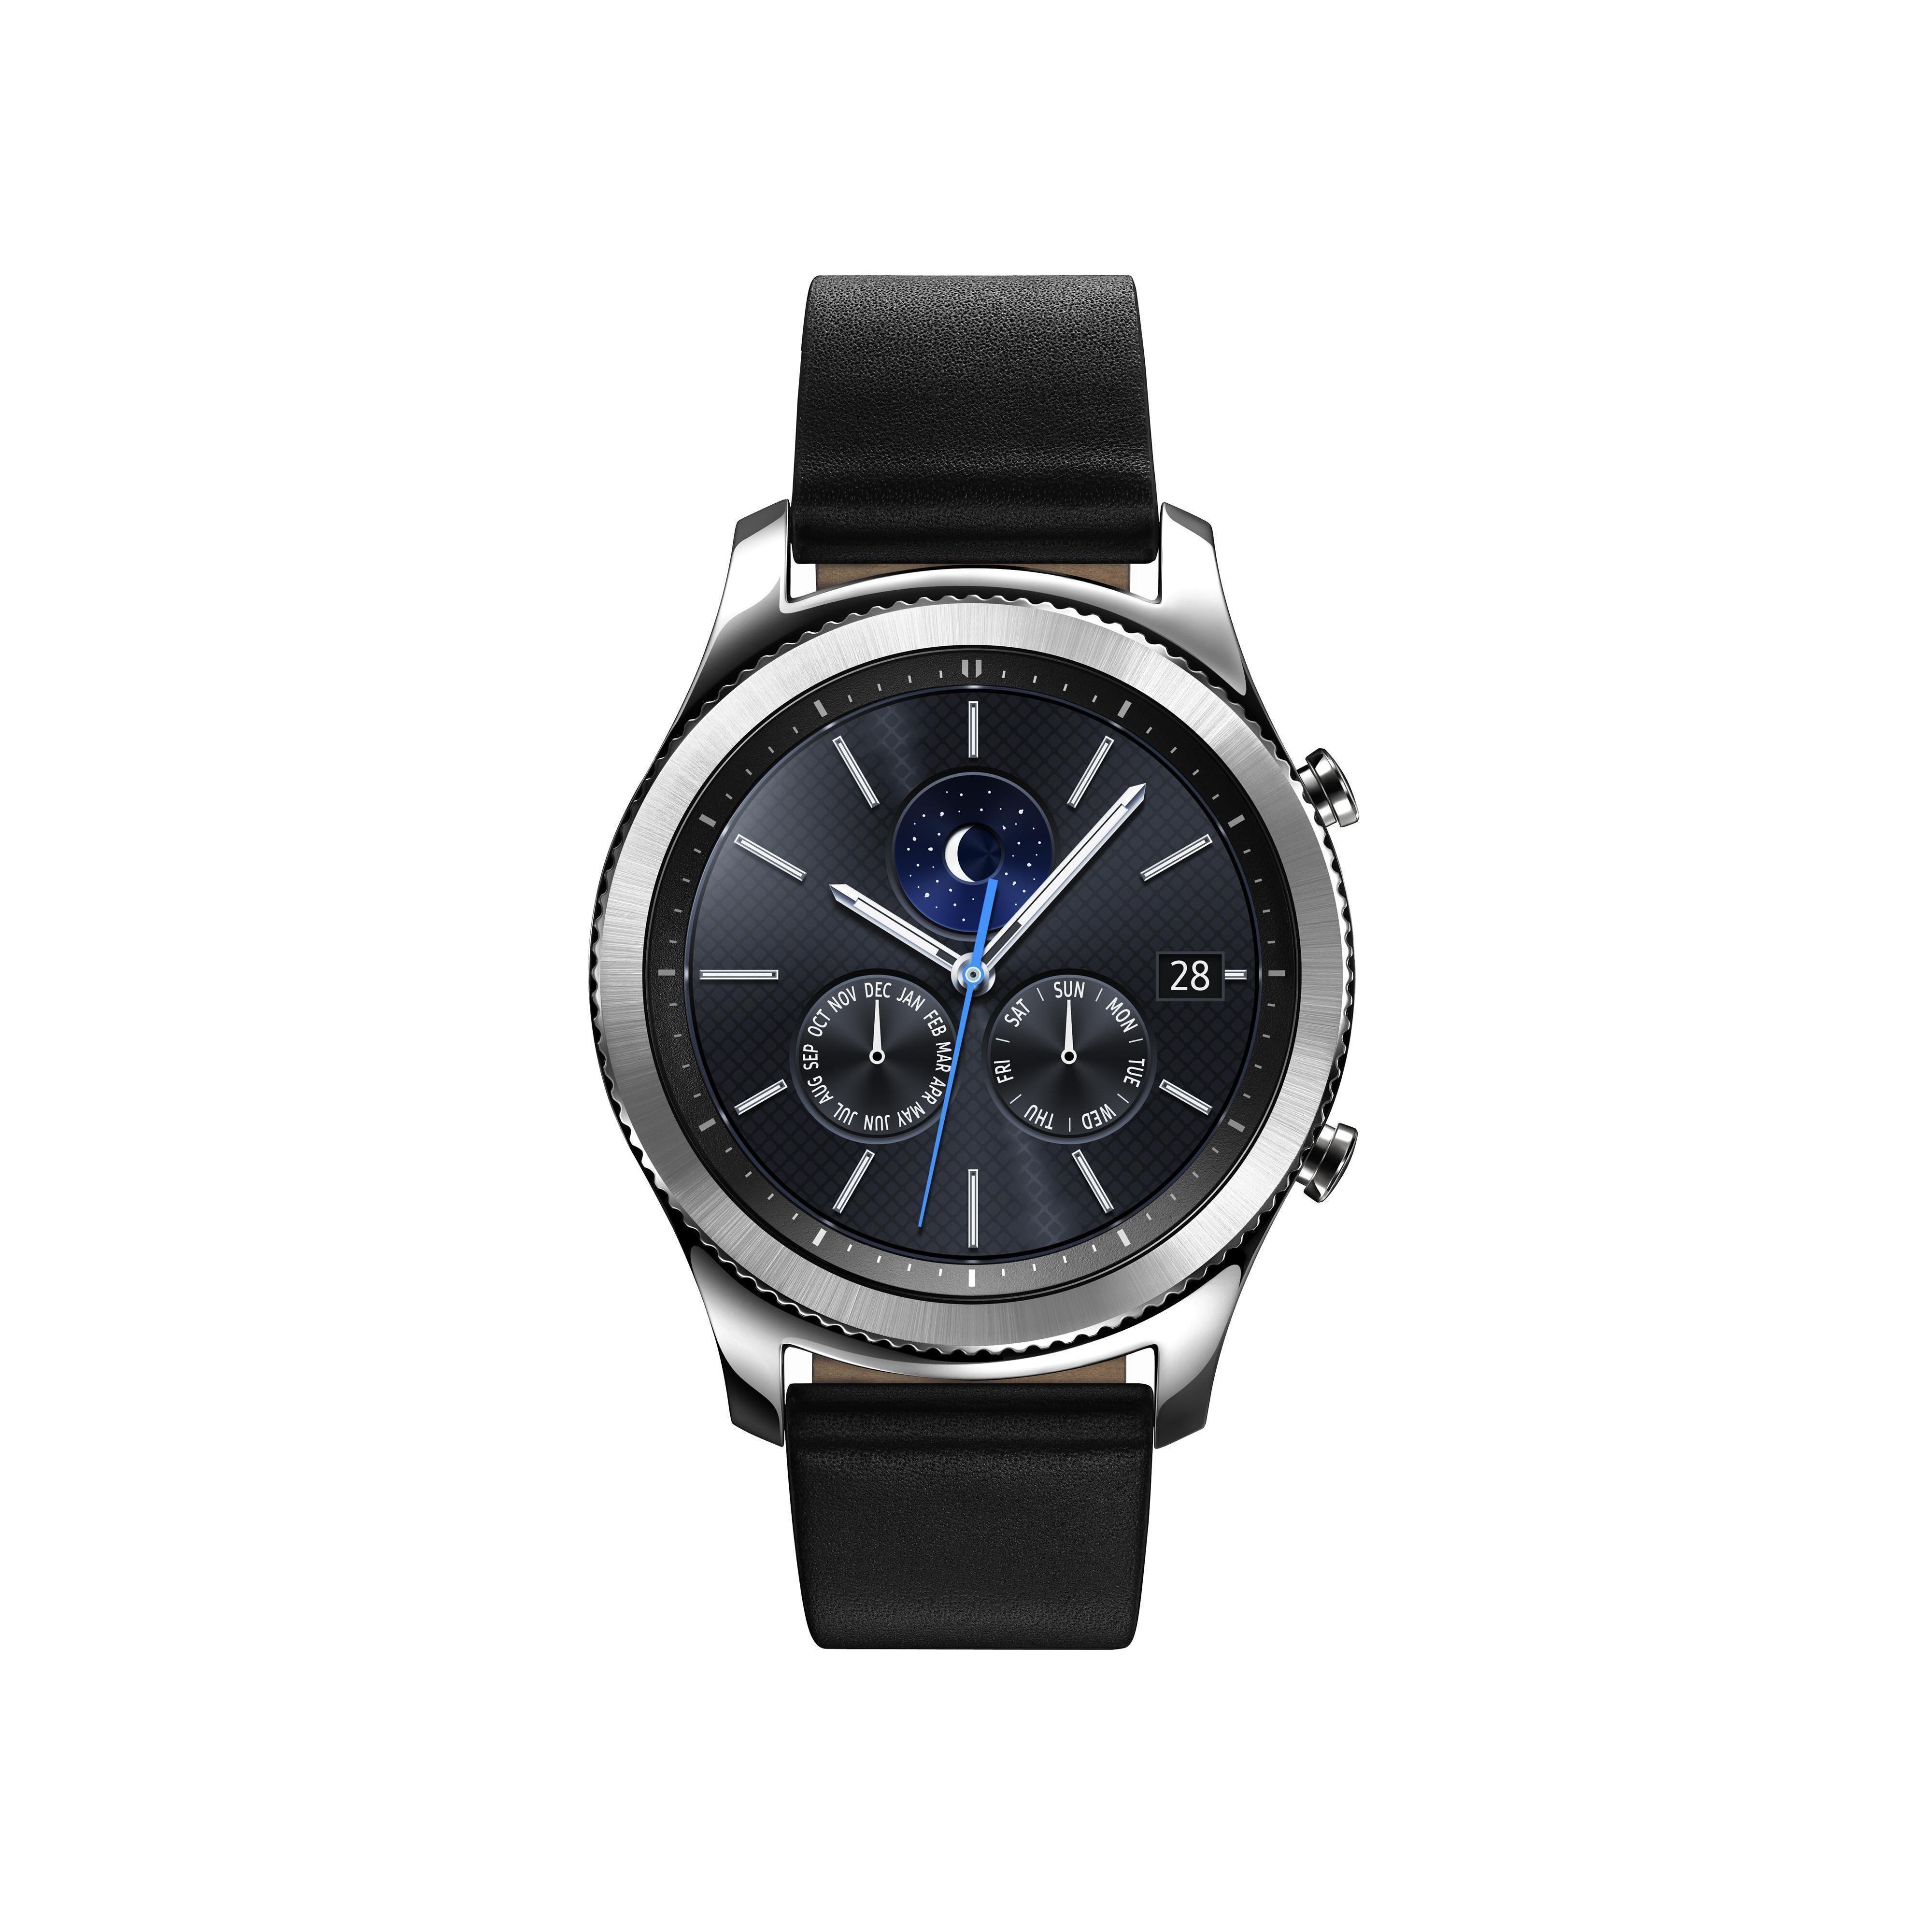 Smartwatch  Gear S3 Classic Silver | Refurbished - 12 M. Warranty